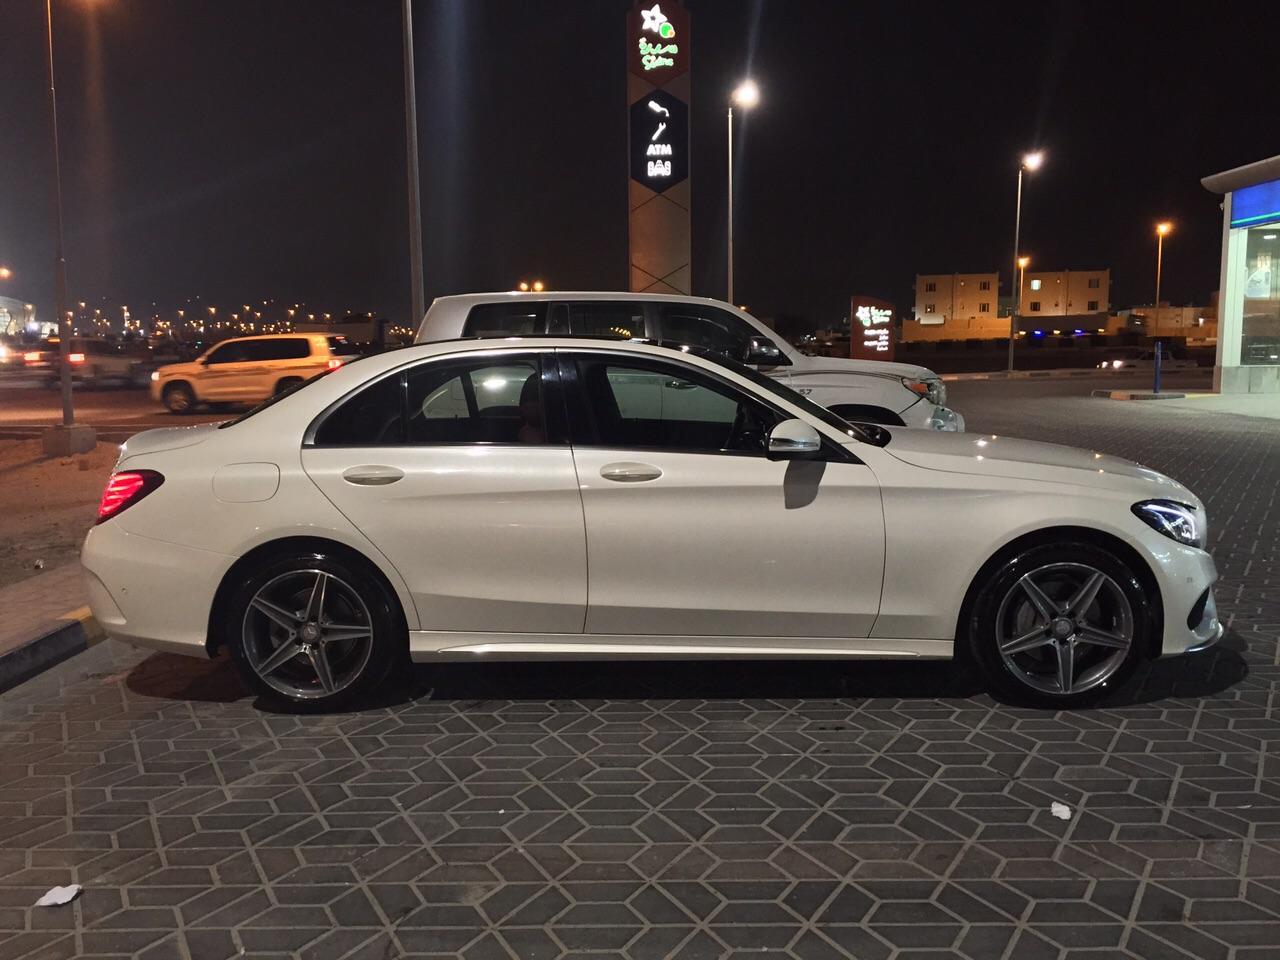 Mercedes benz c class 200 amg qatar living for Mercedes benz qatar